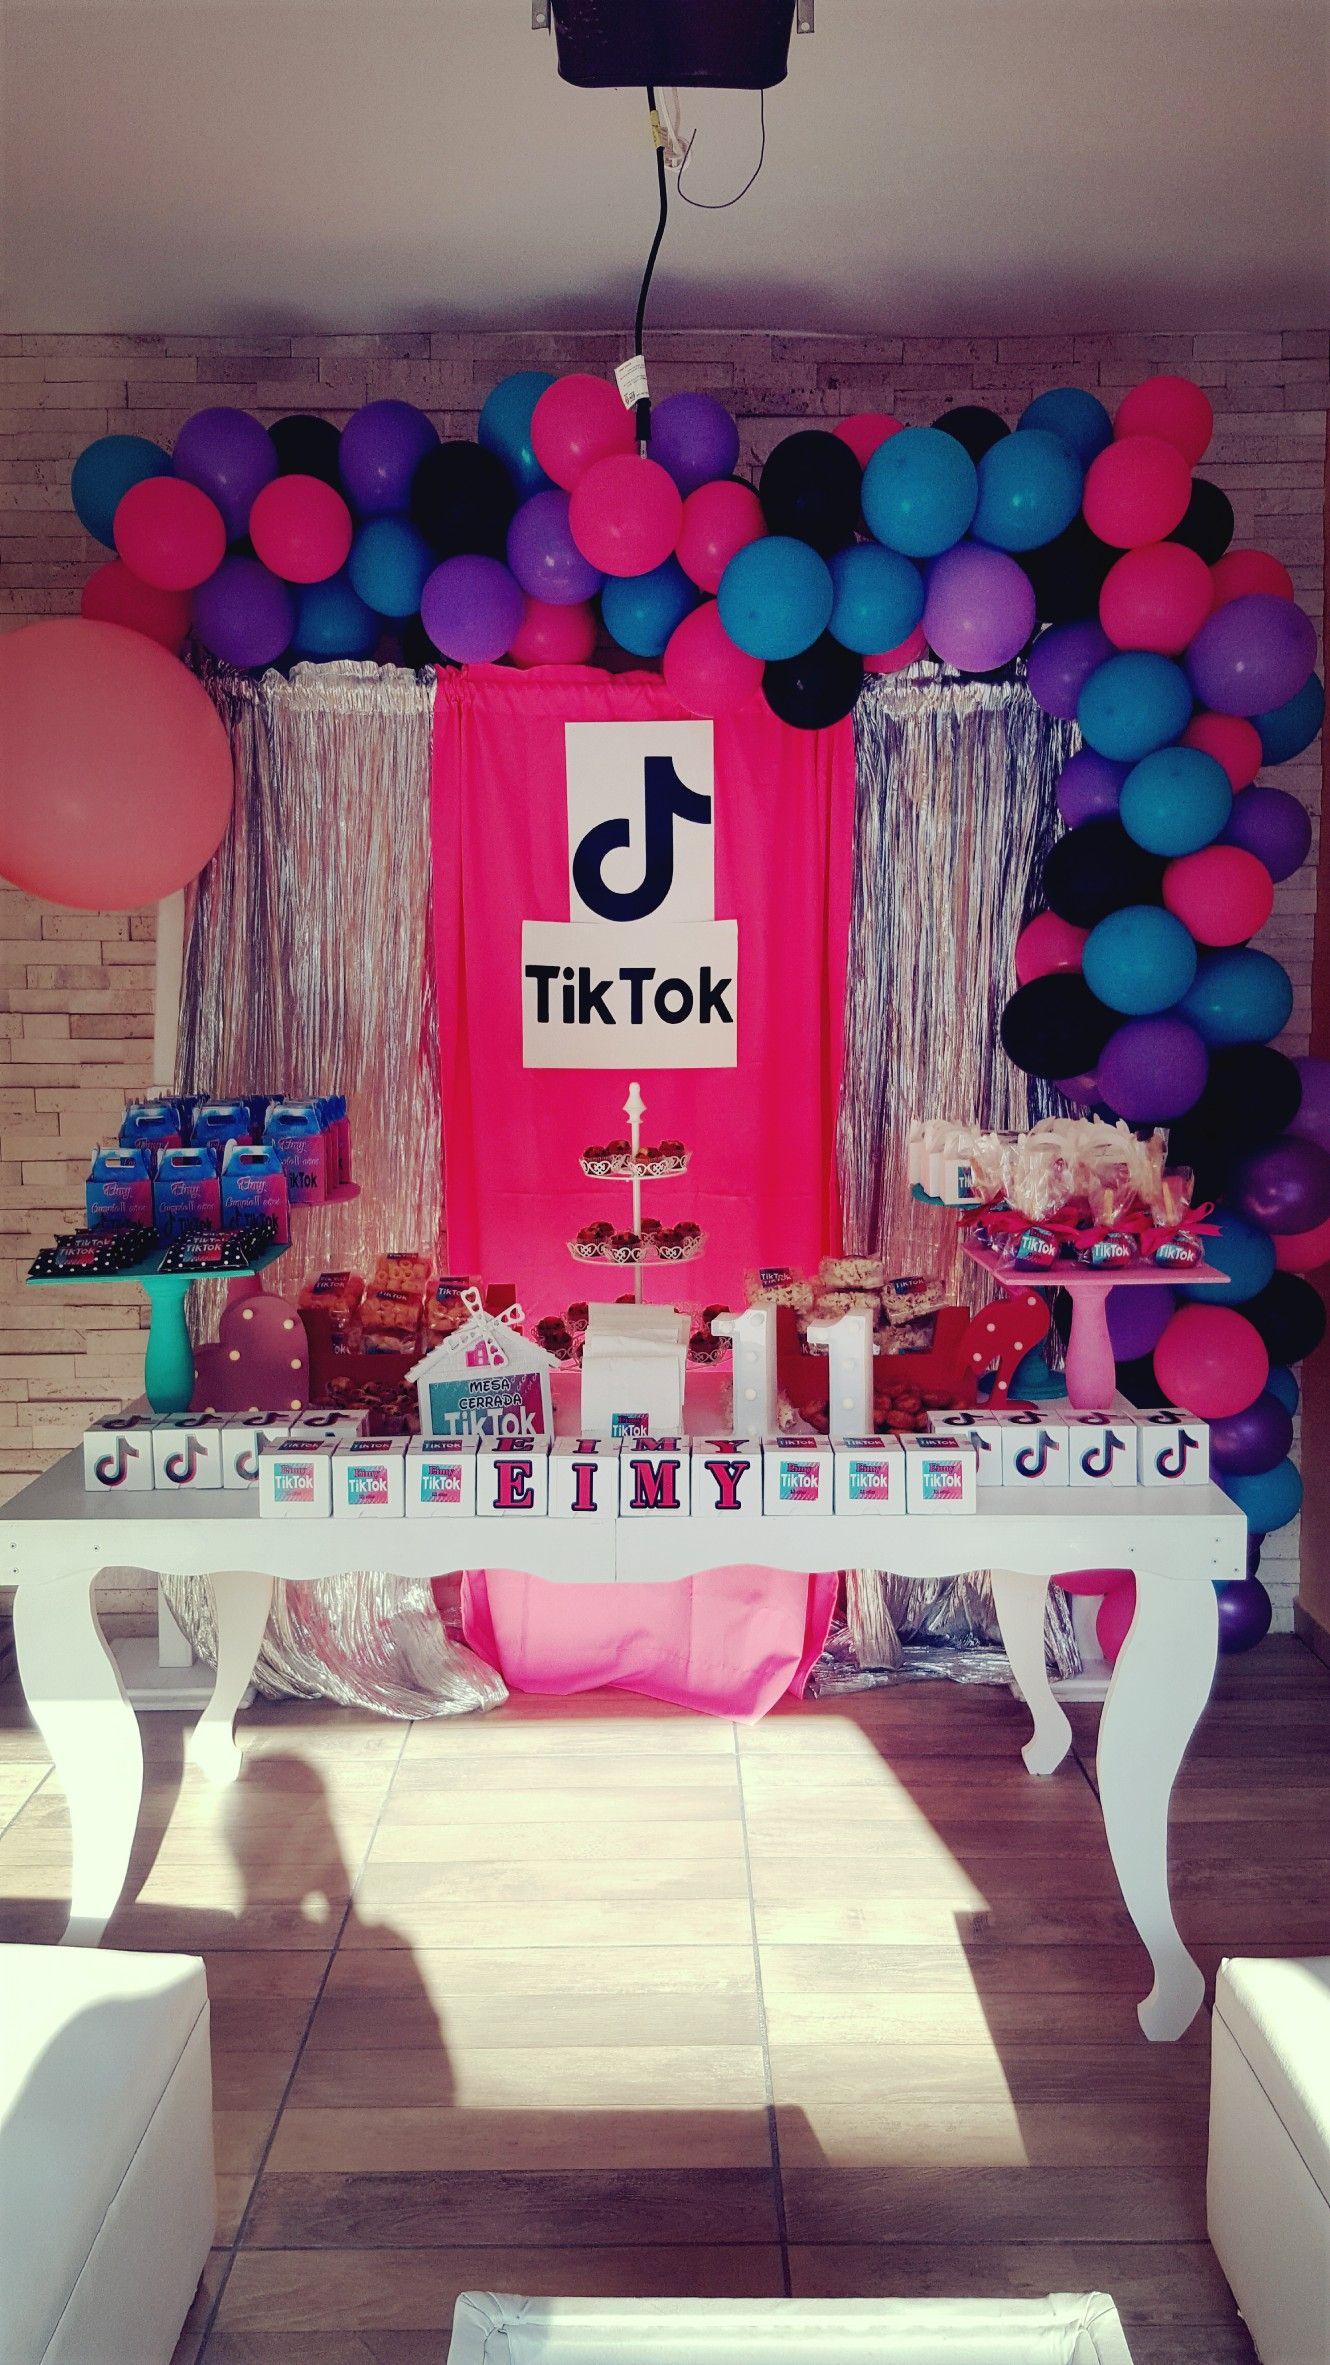 Tik Tok Teenage Birthday Party Birthday Surprise Party 12th Birthday Party Ideas